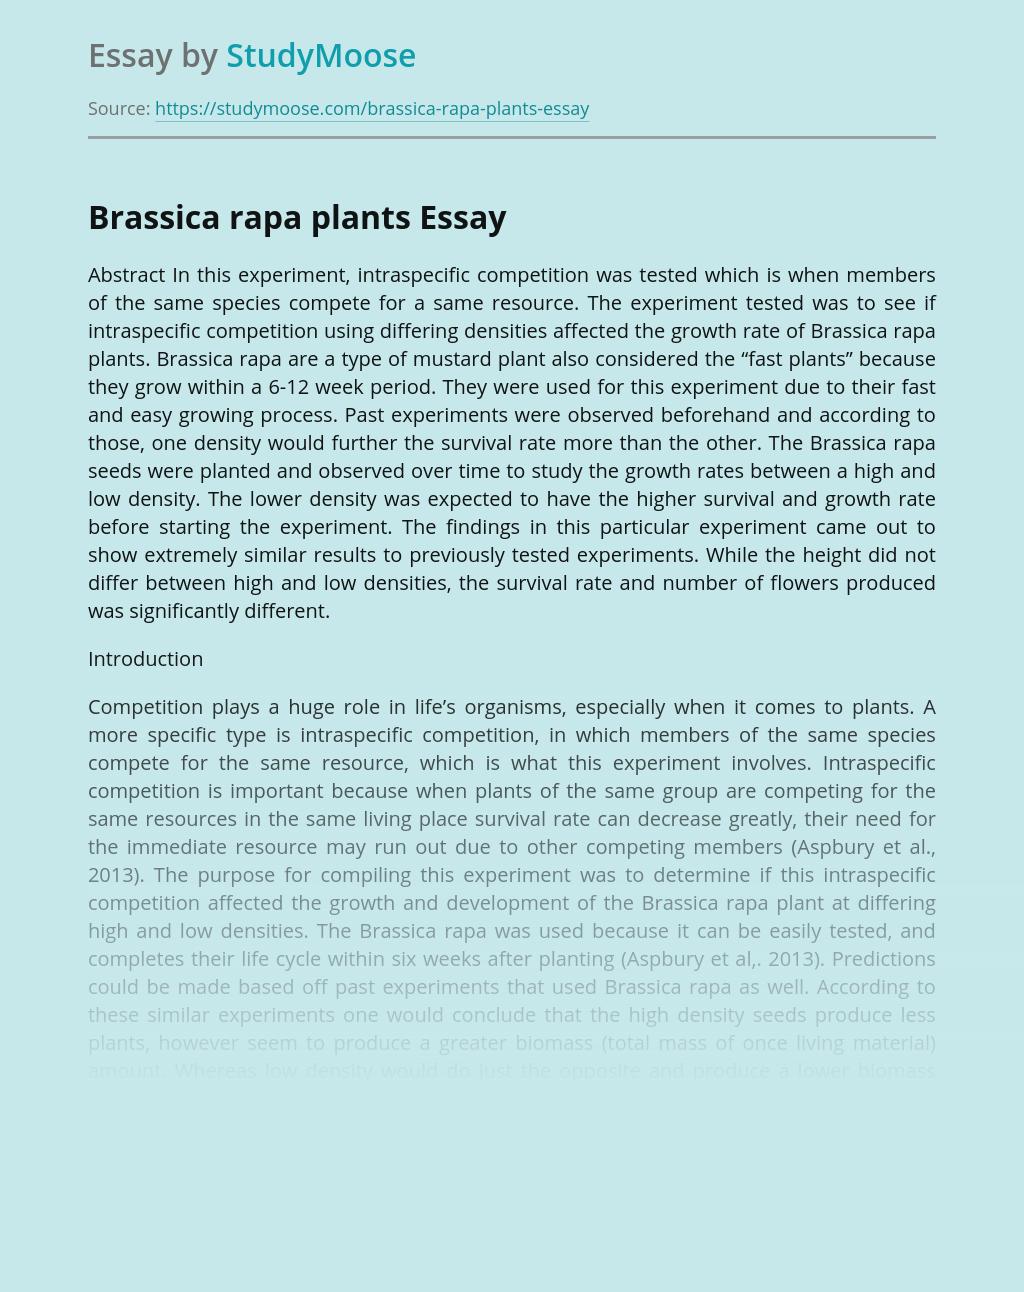 Brassica rapa plants